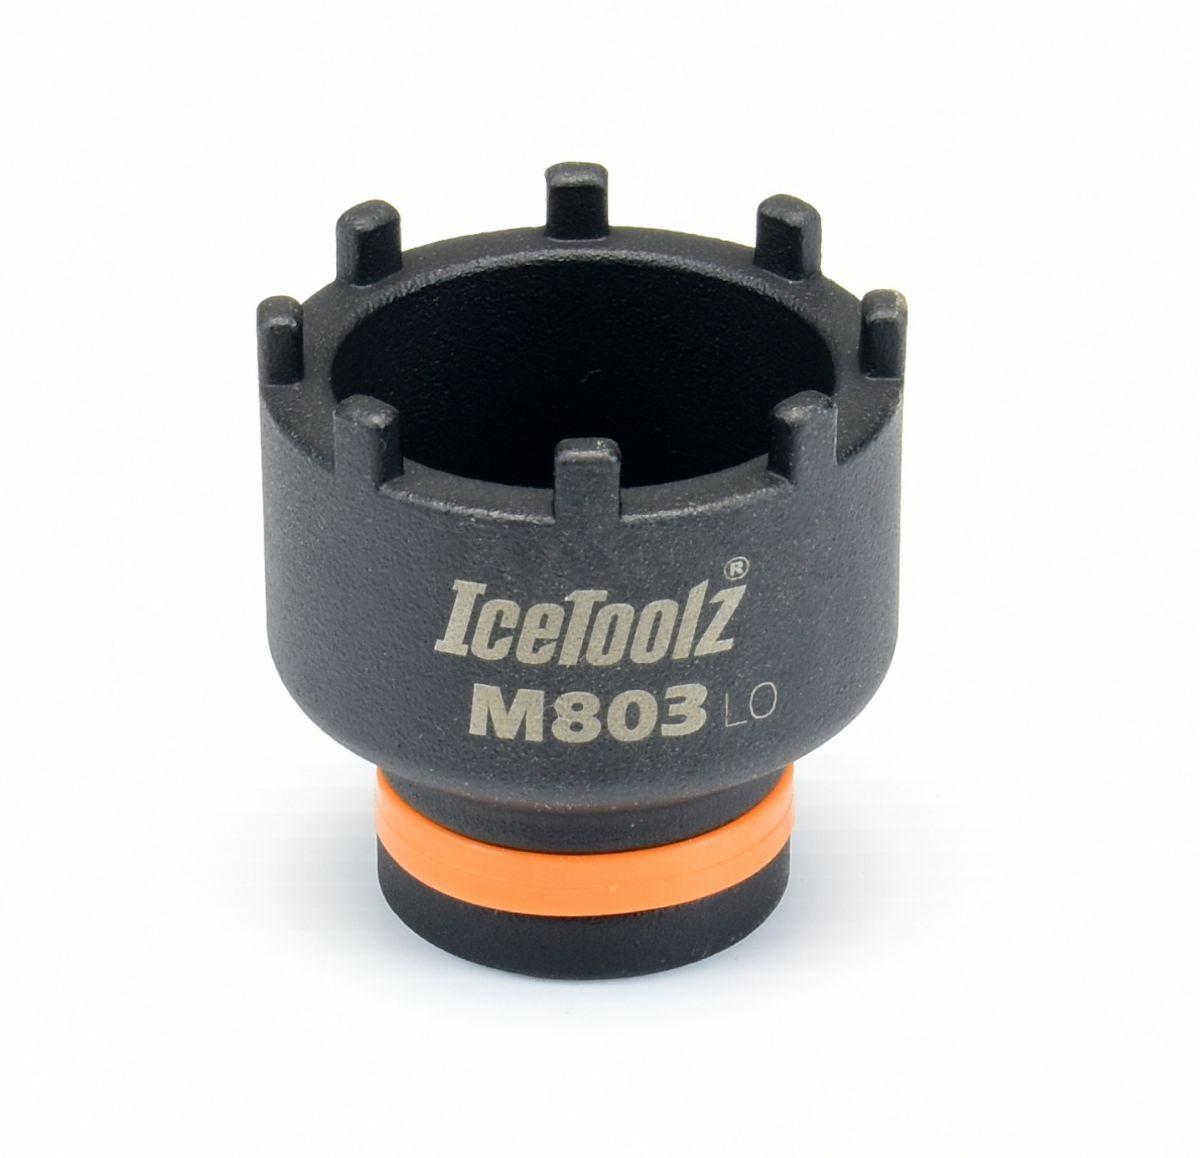 icetoolz borgring afnemer m803 bosch gen4 zwart